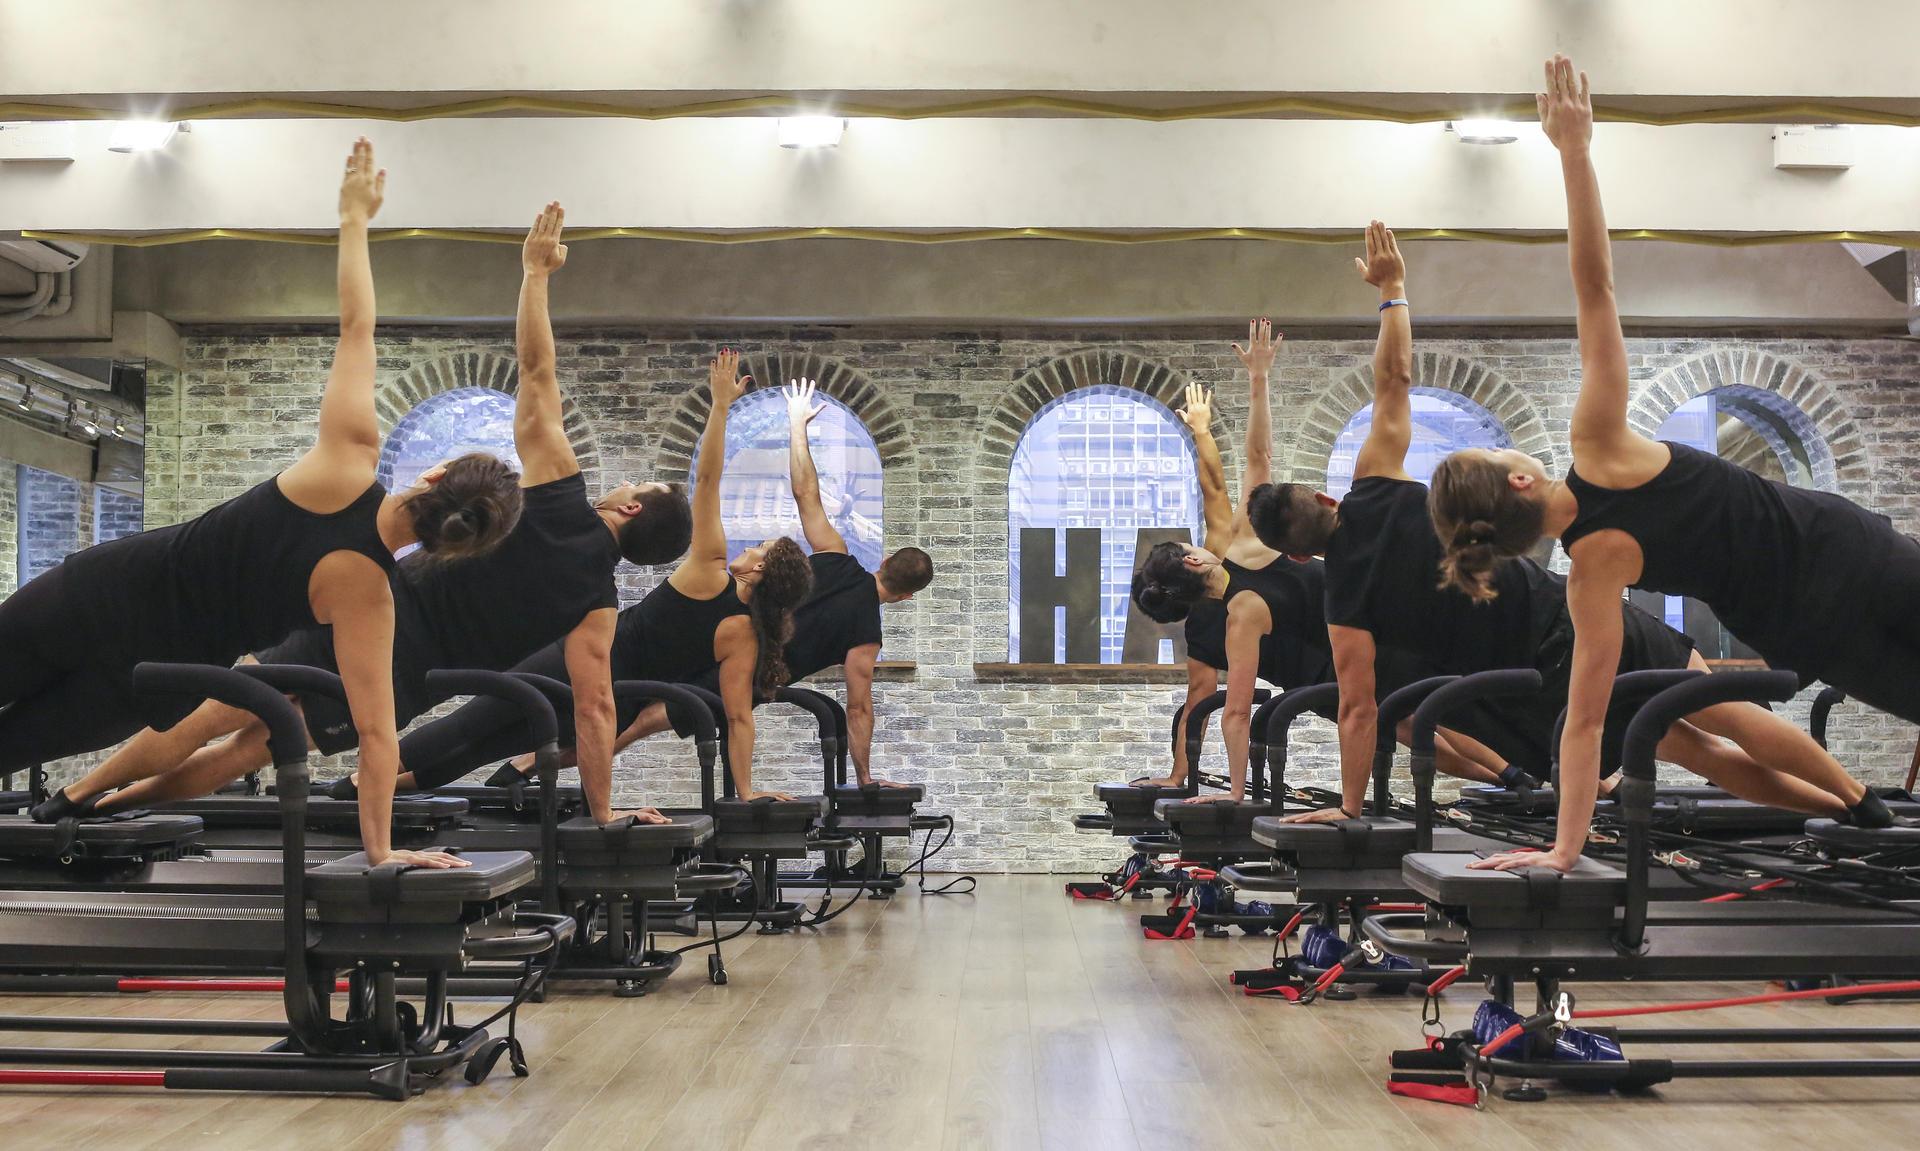 A Lagree Fitness class at H-Kore Gym in Hong Kong / Photo: South China Morning Post